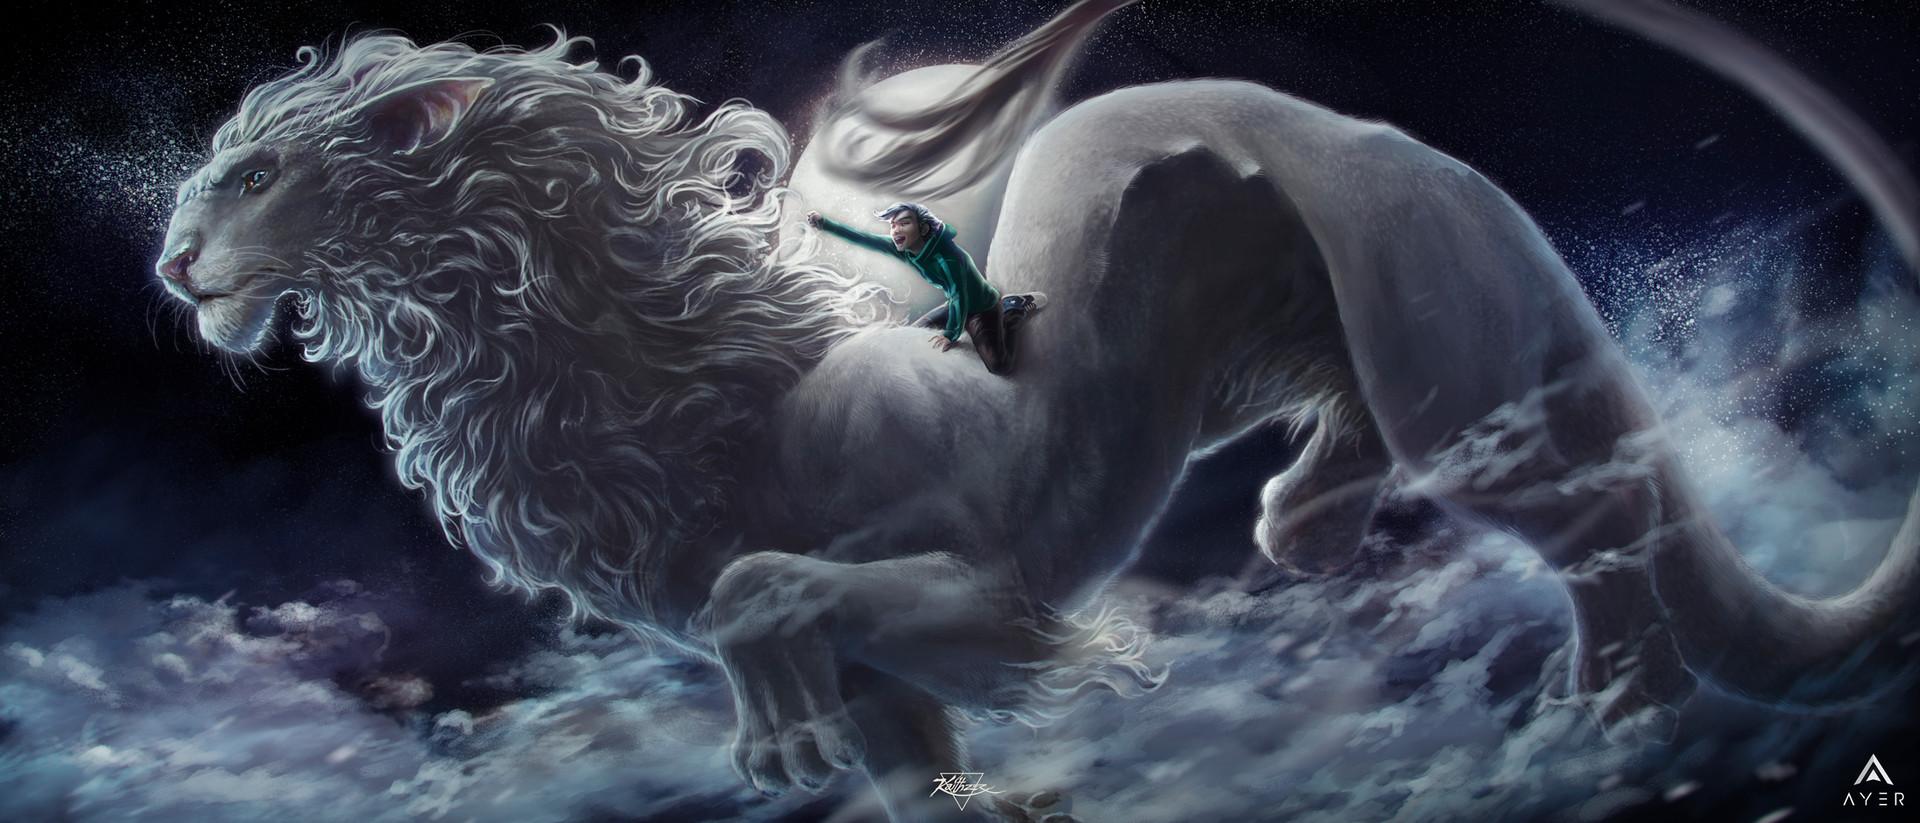 Kaithzer morejon matt dragon web